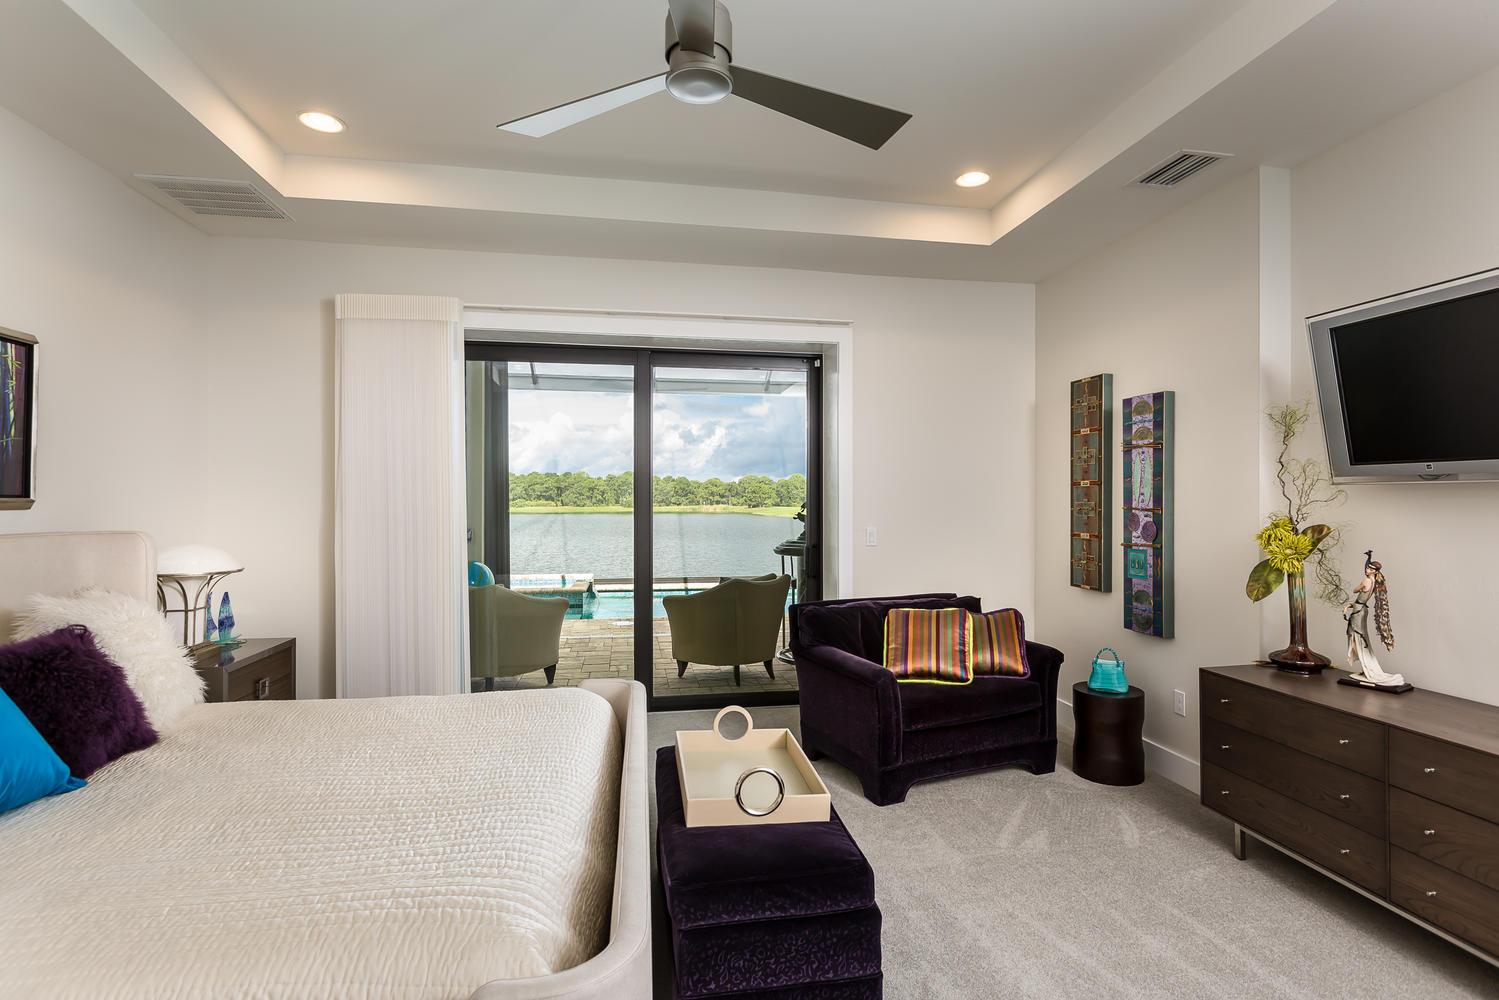 Custom Built Home by Vantage-large-015-28-Bedroom-1499x1000-72dpi